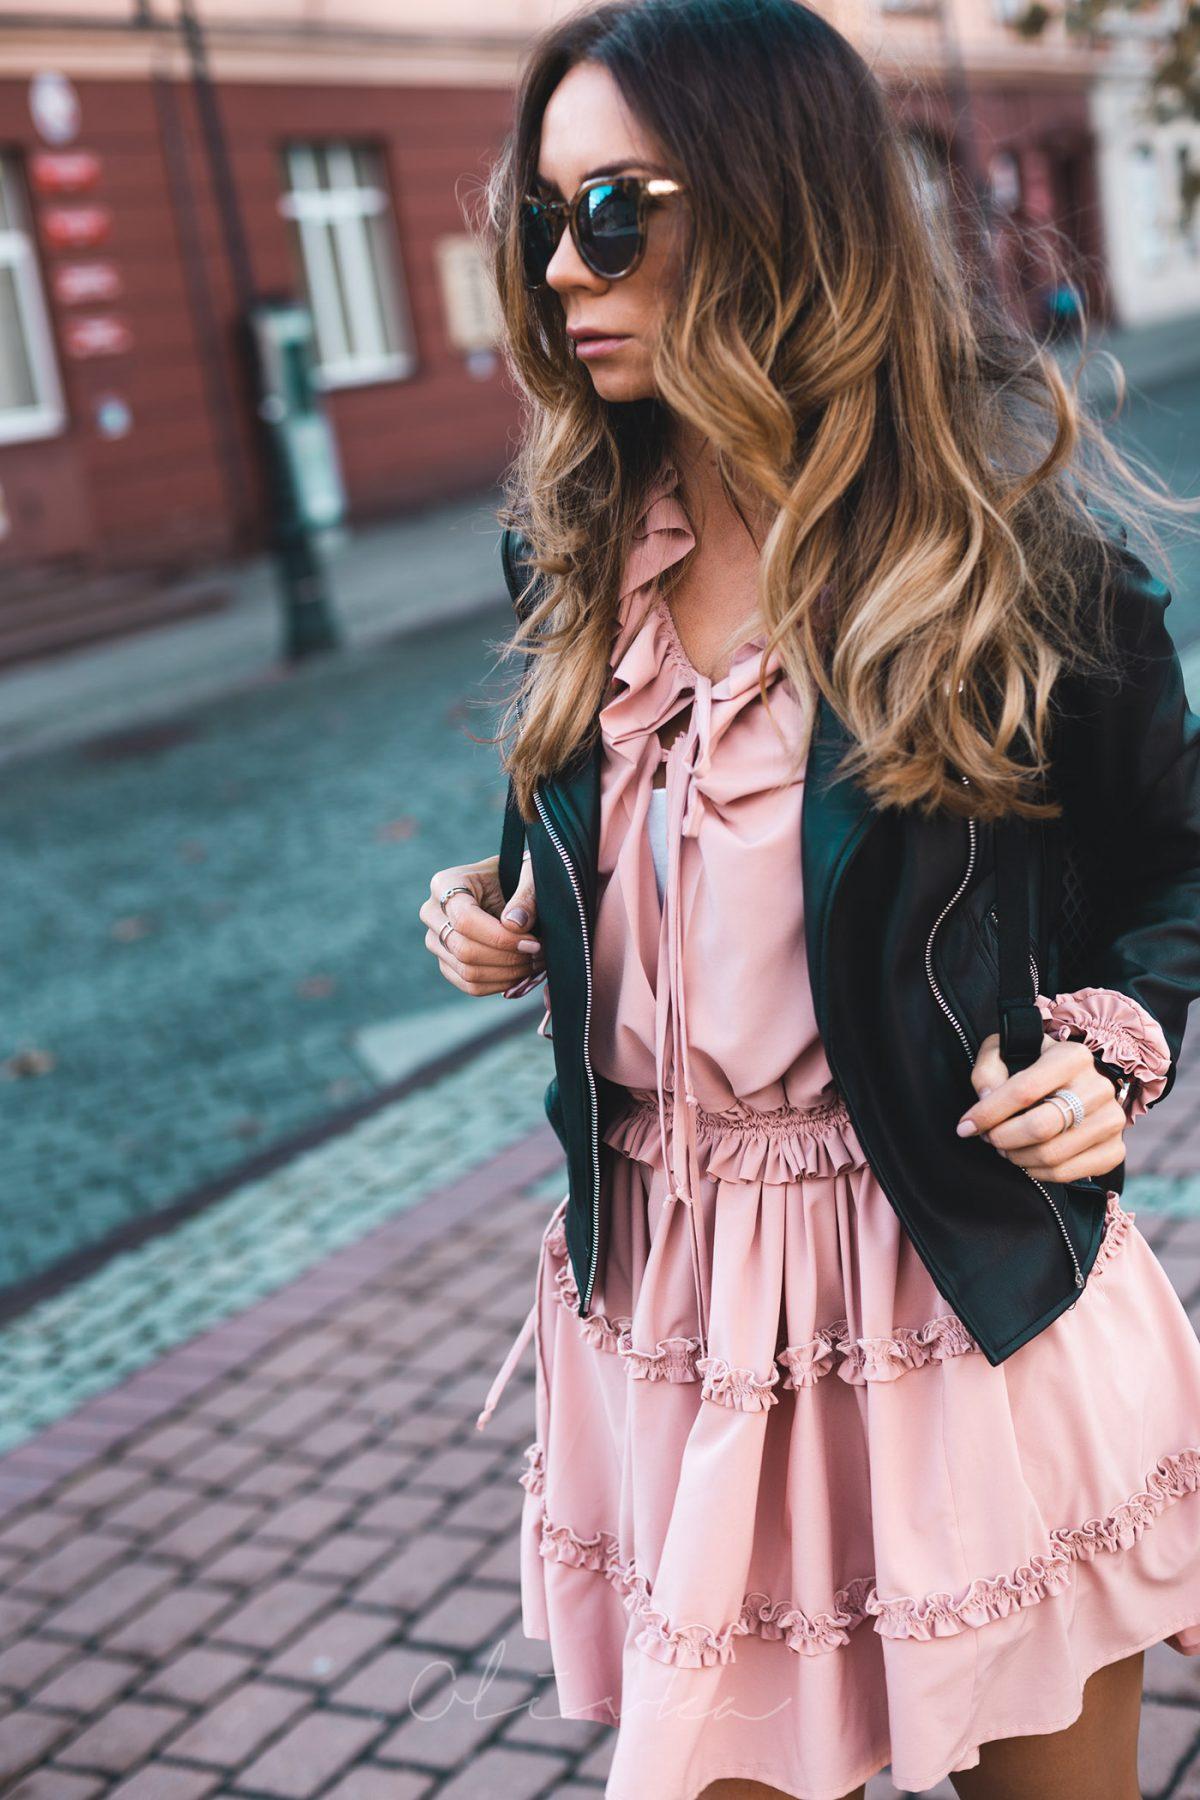 OOTD PINK DRESS